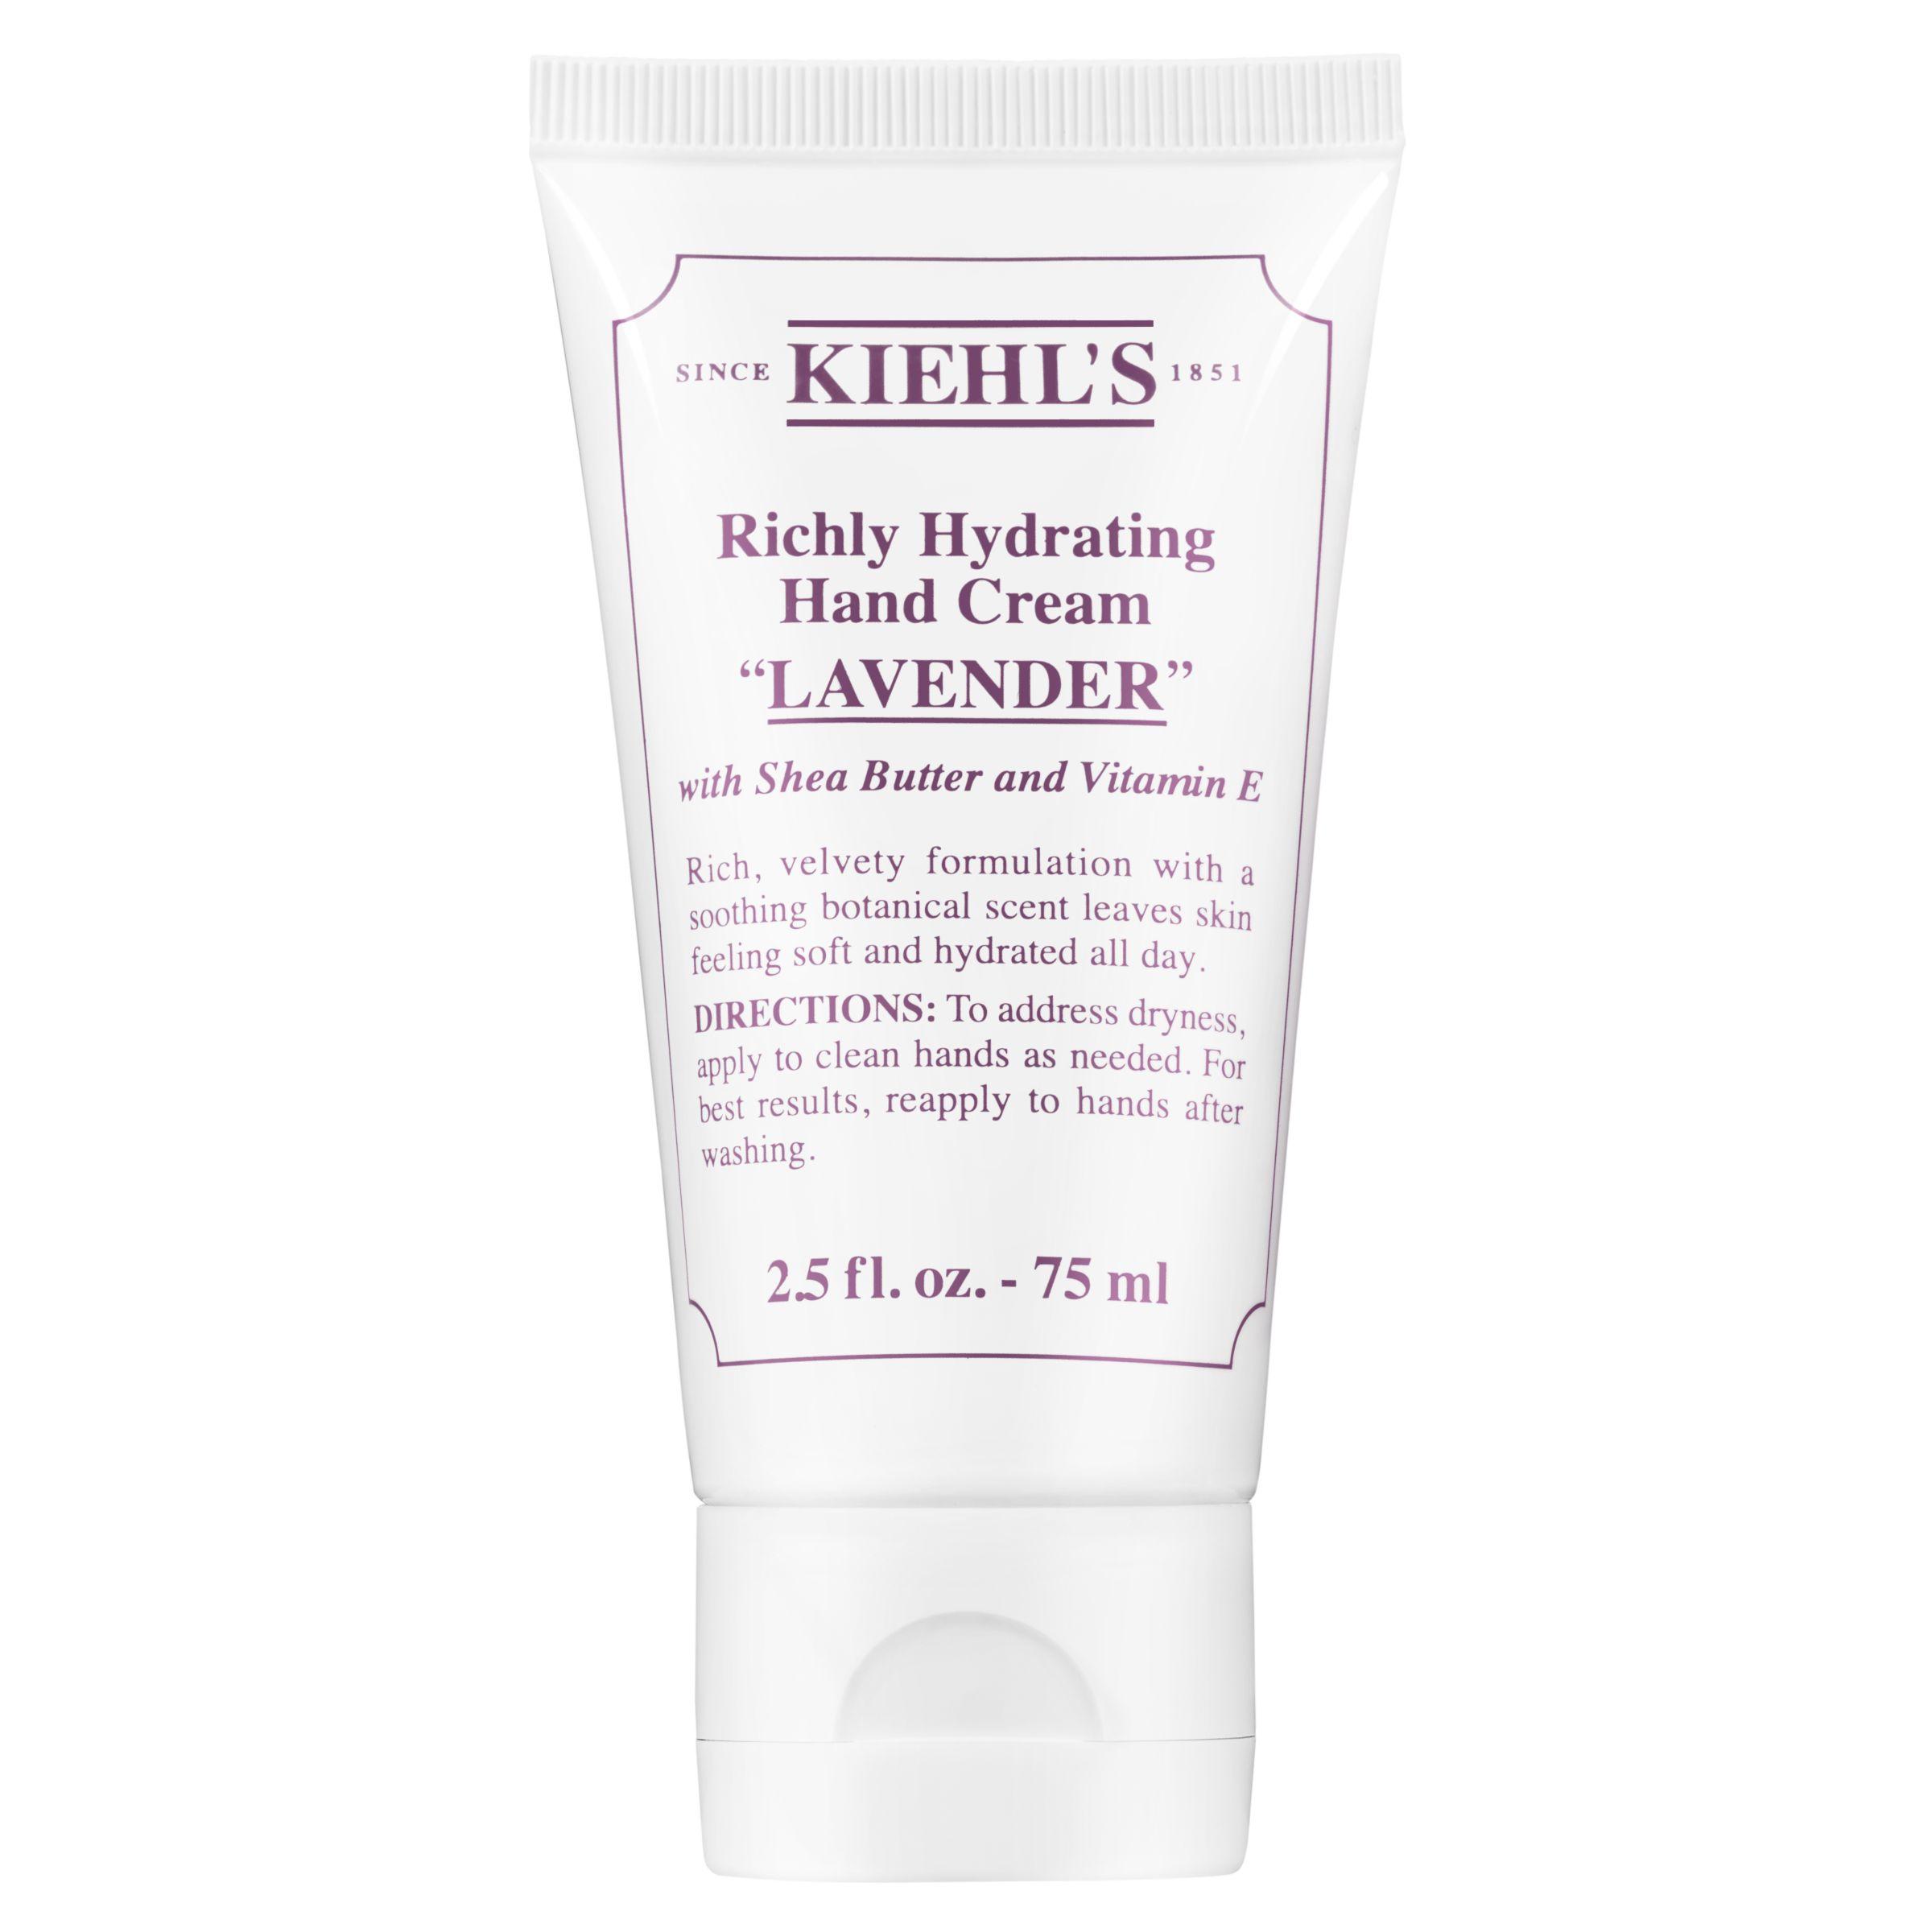 Kiehls Kiehl's Richly Hydrating Hand Cream, Lavender, 75ml